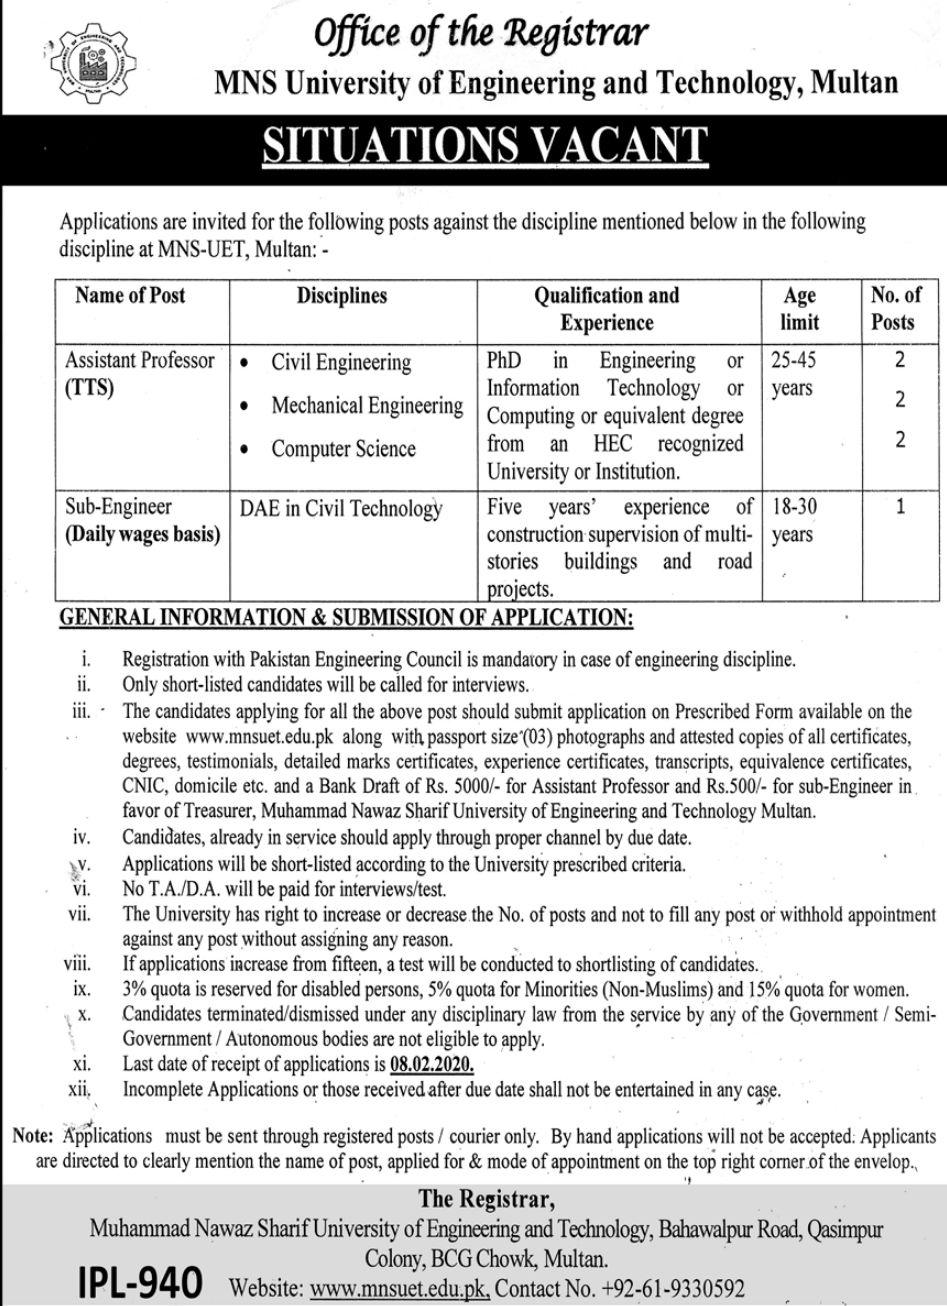 Engineering and Technology MNS University Multan Jobs 2021